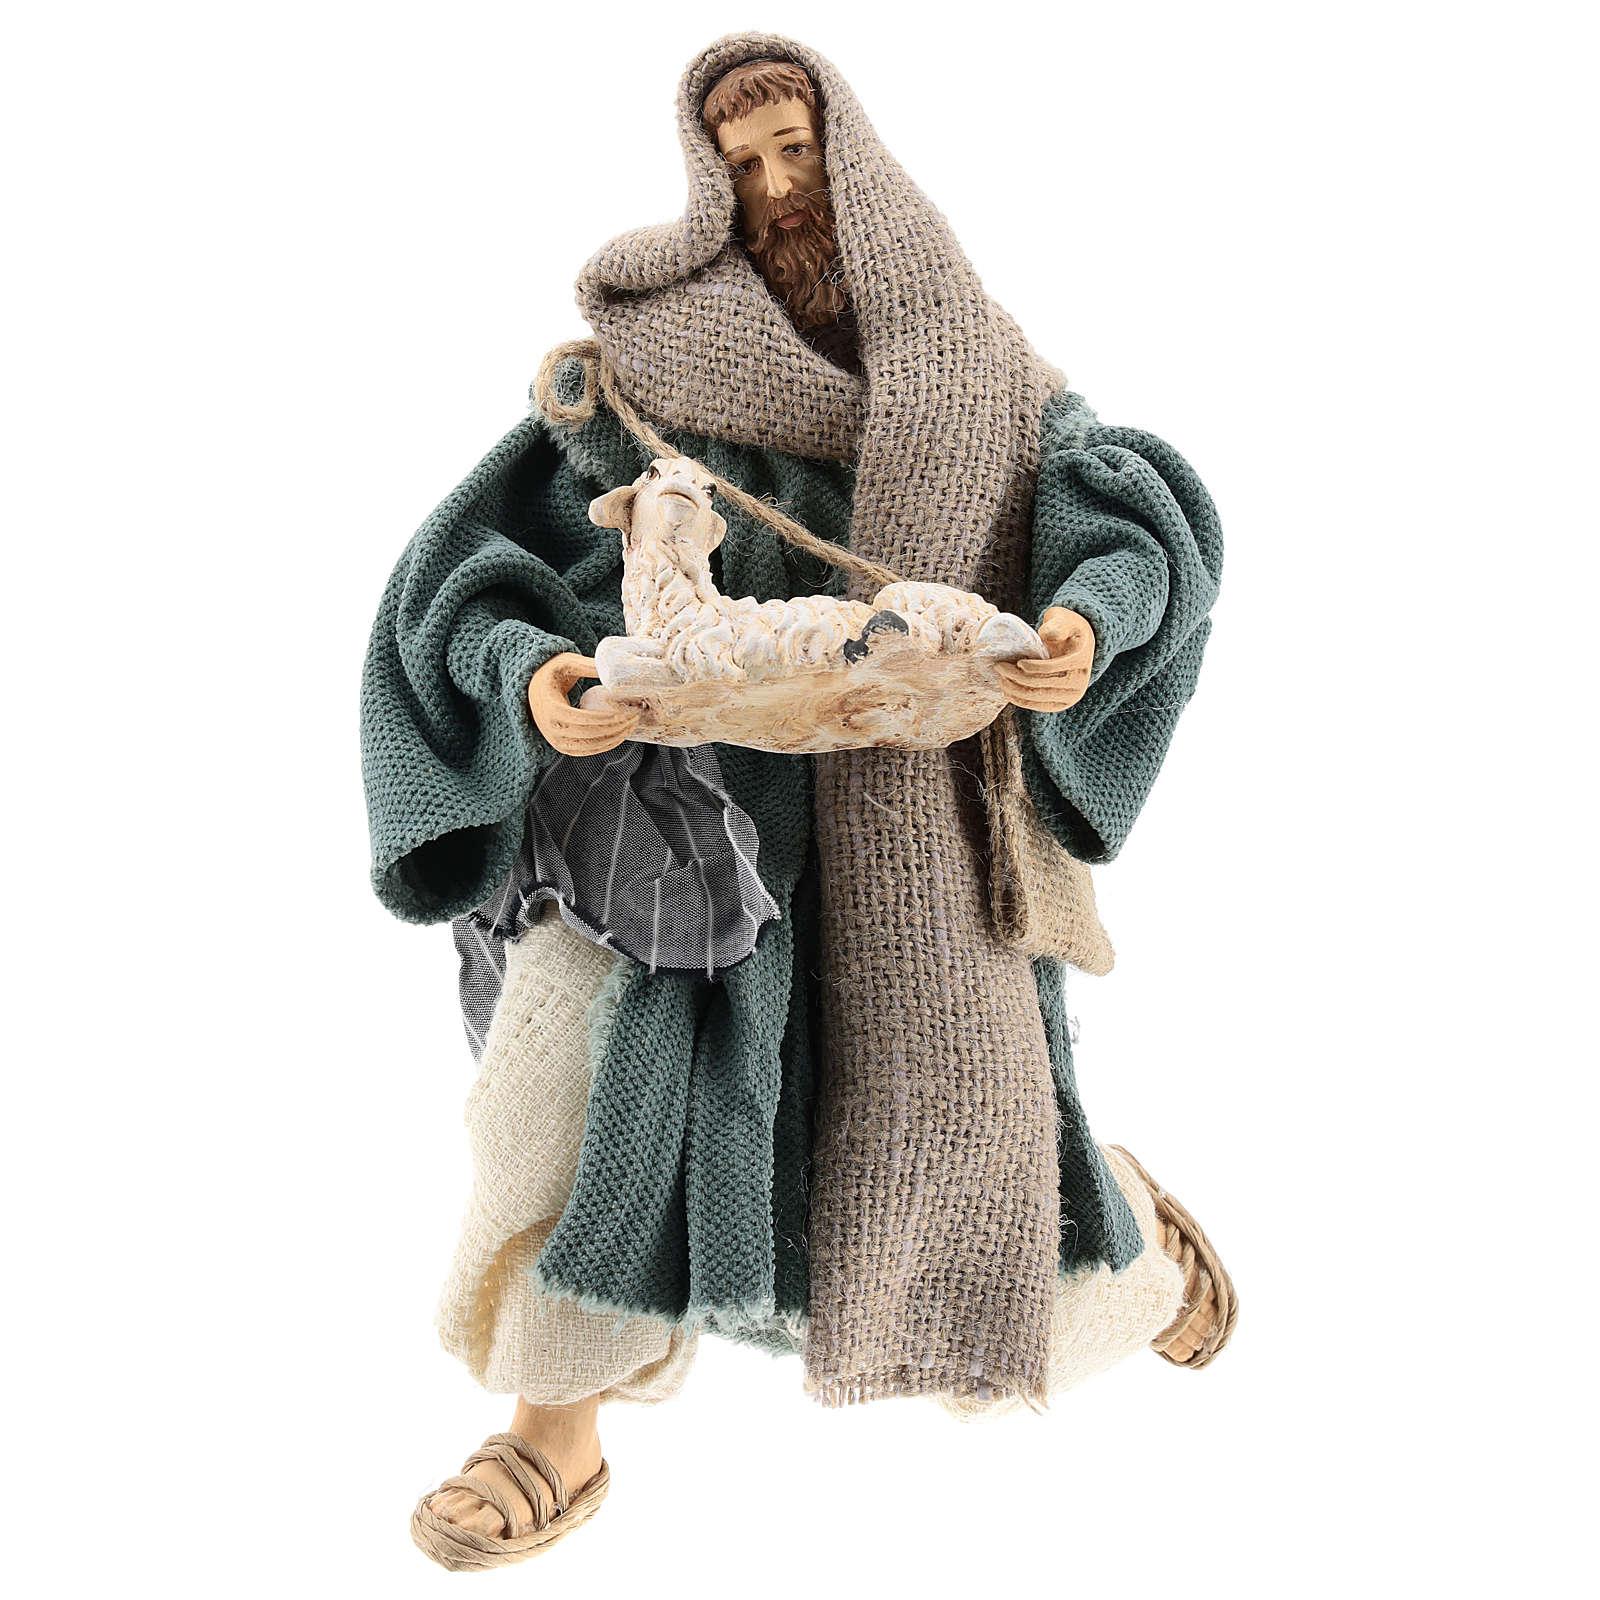 Pastore 30 cm inginocchiato con pecorella Shabby Chic 3